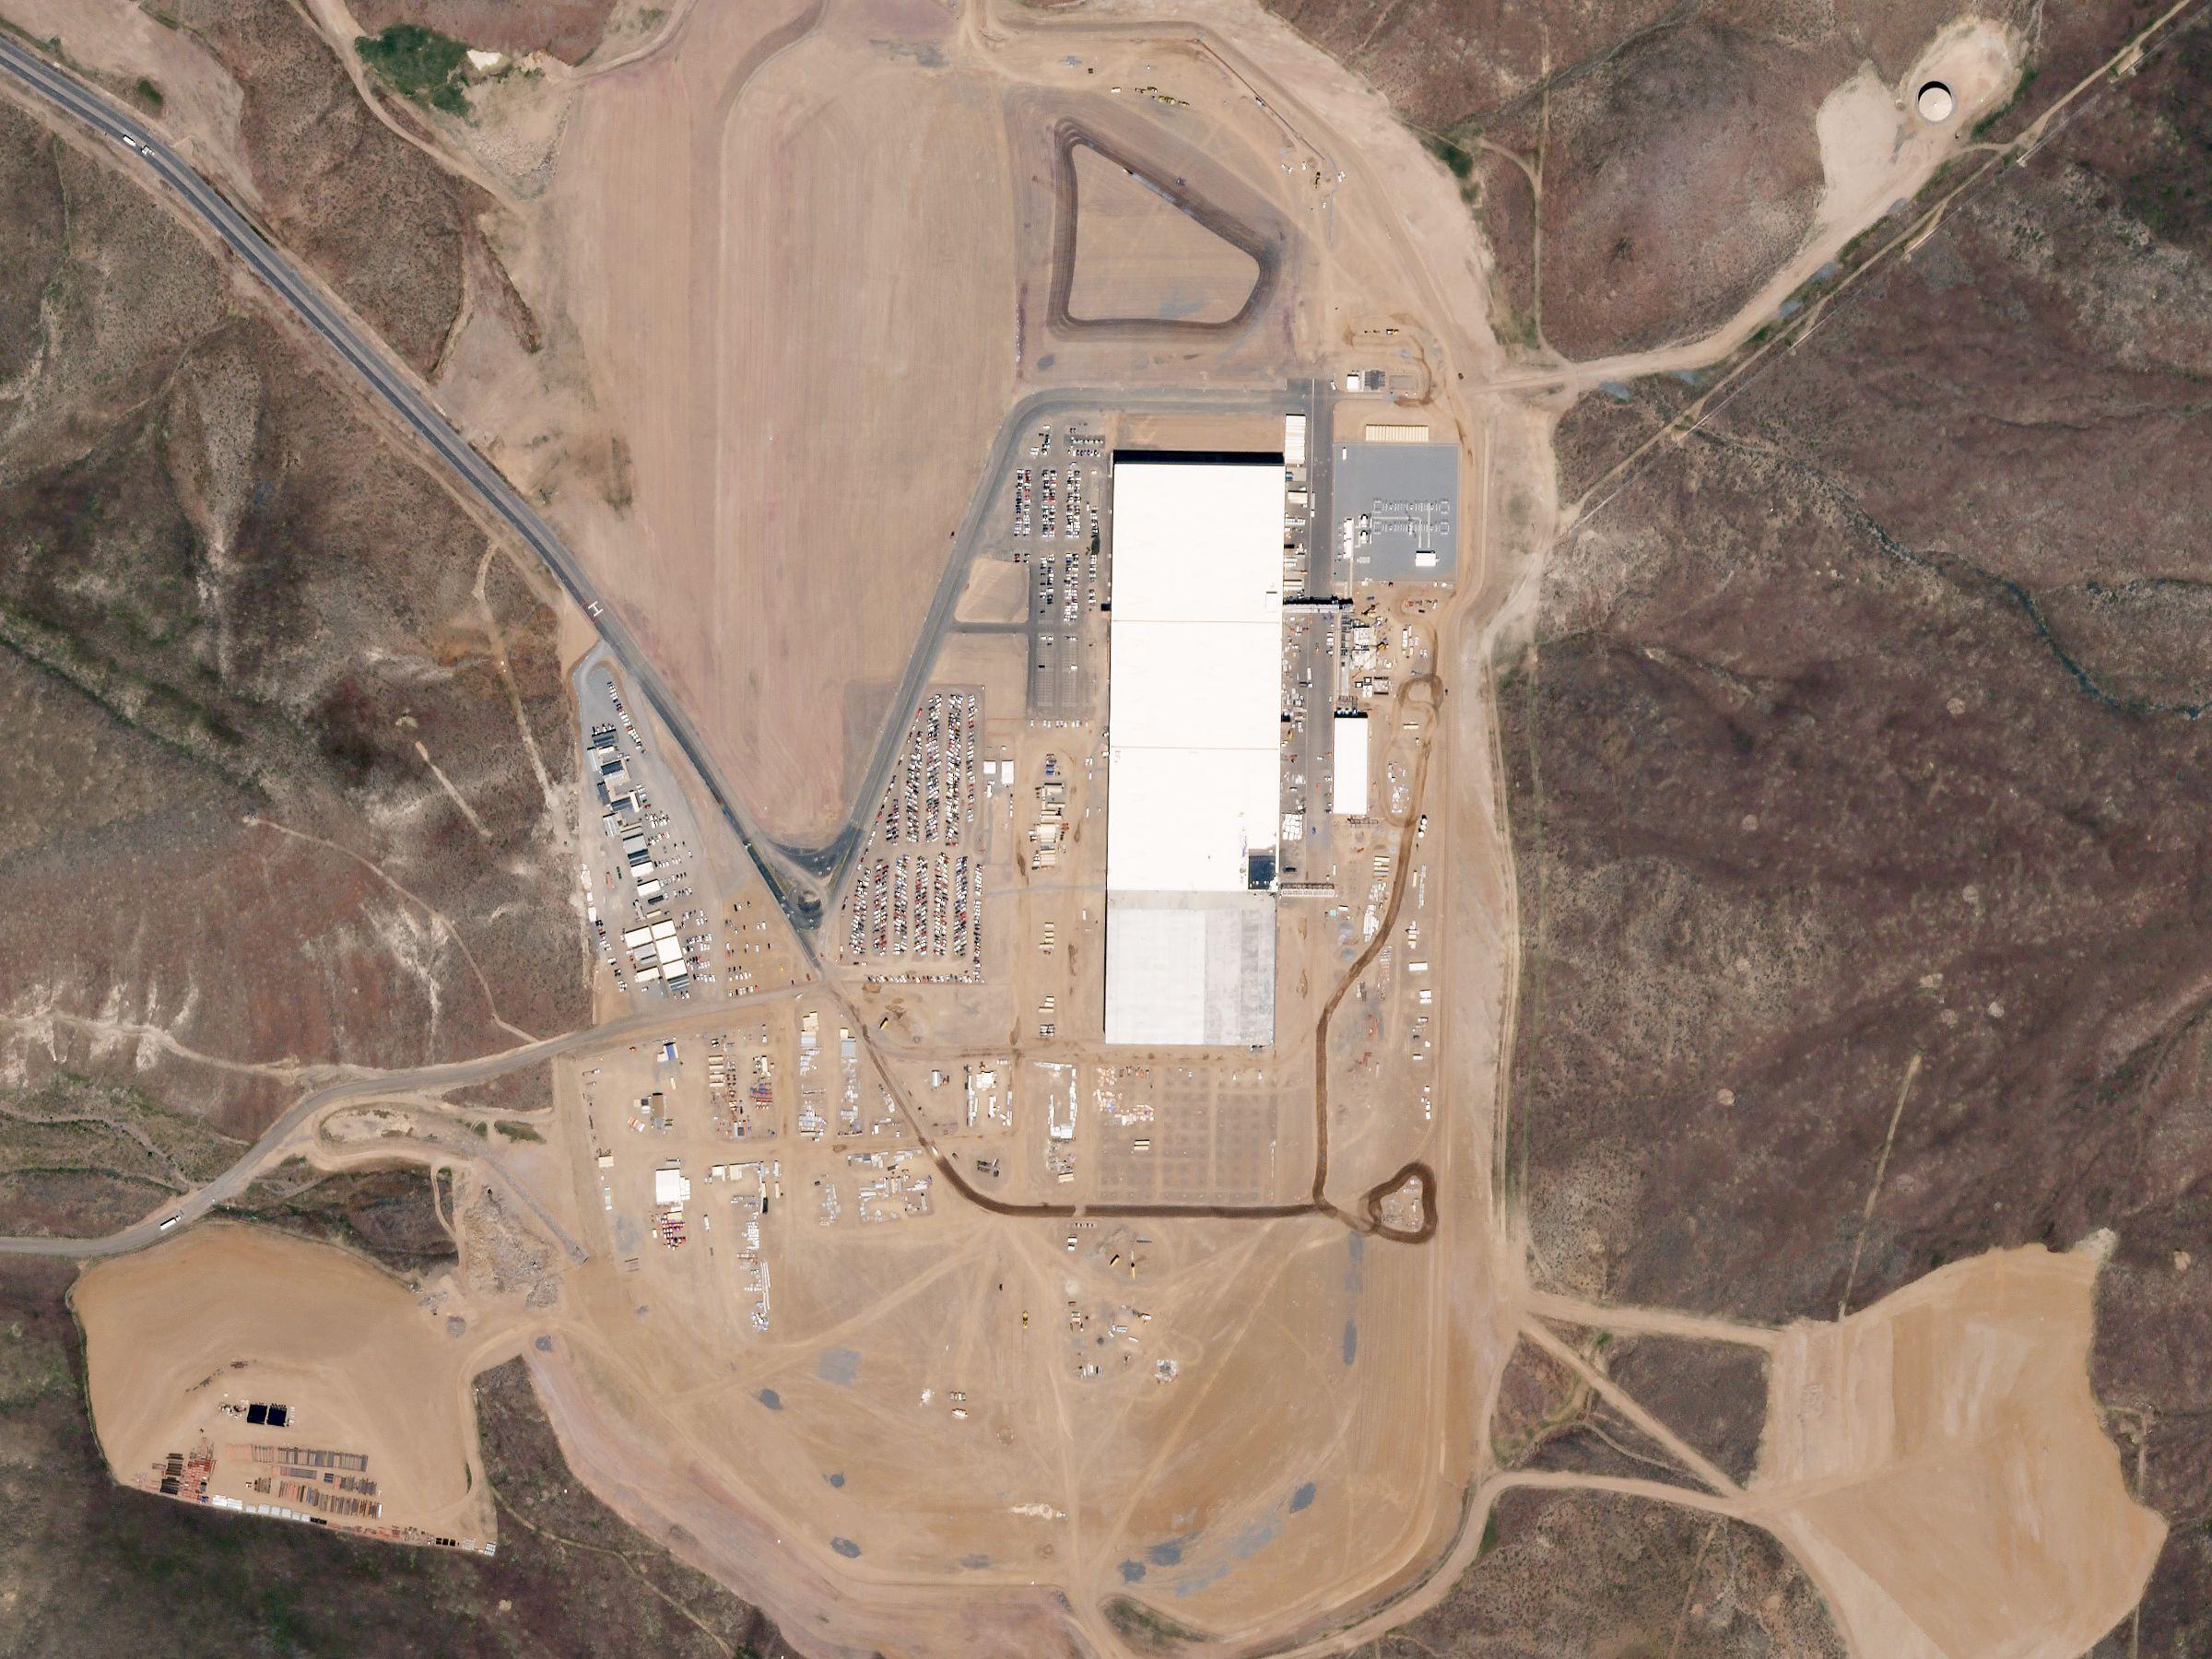 File Tesla S Gigafactory On 2016 05 11 By Planet Labs Jpg